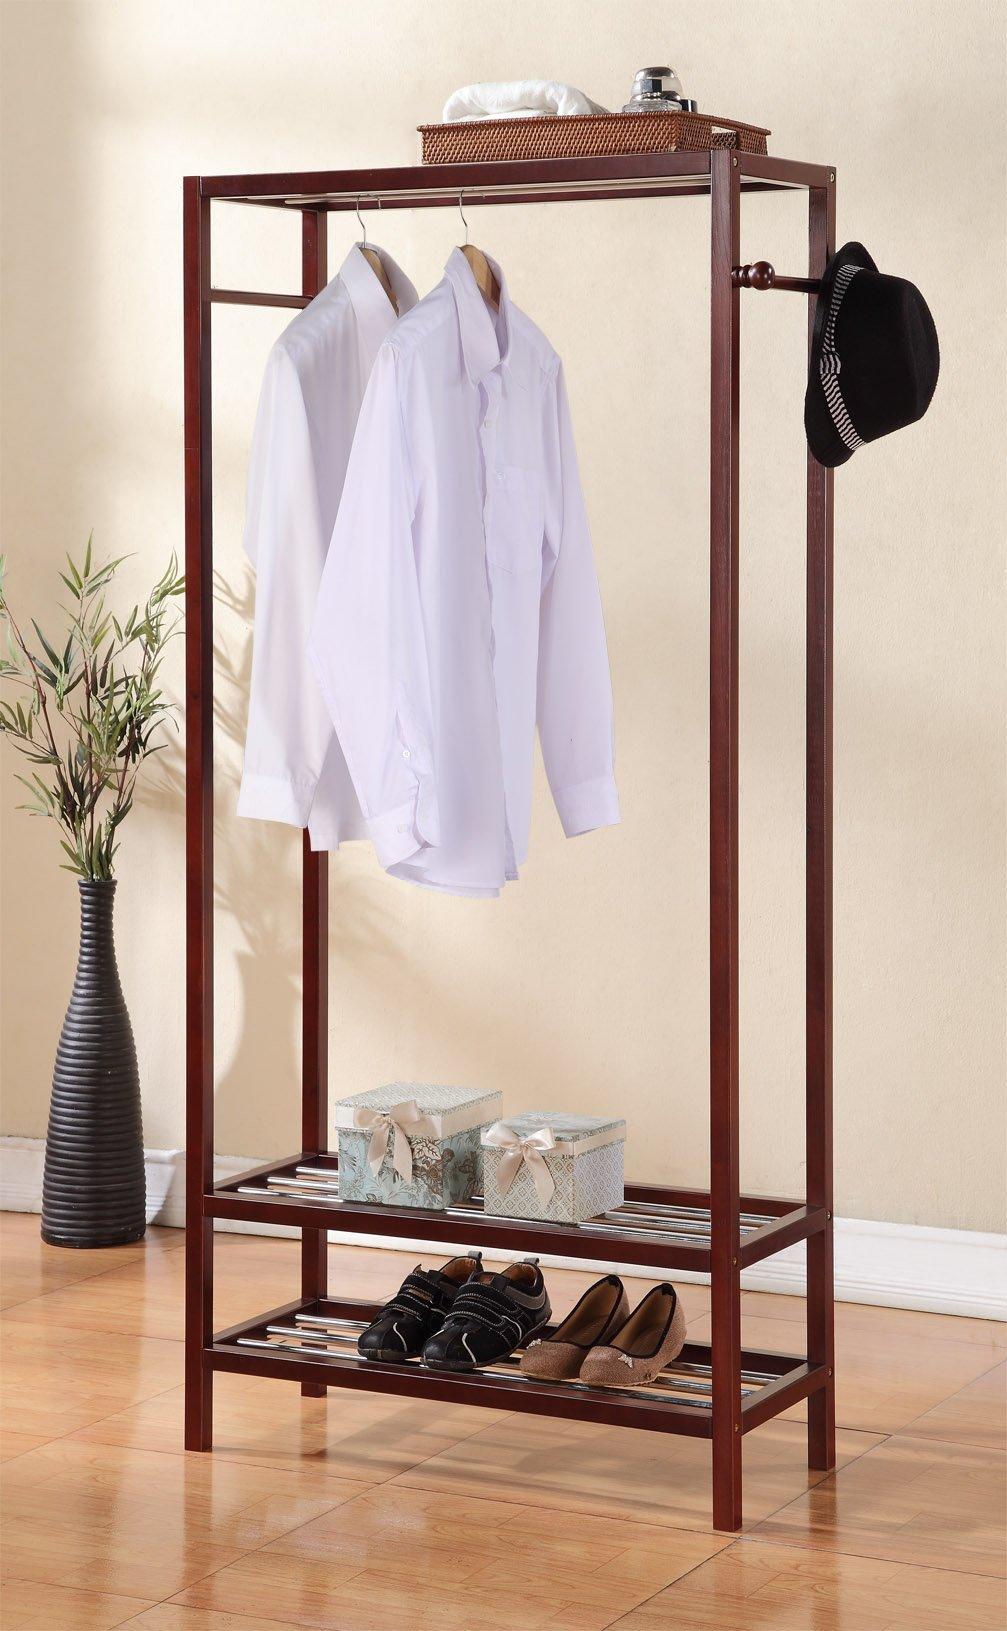 Wood Clothing Racks: Amazon.com